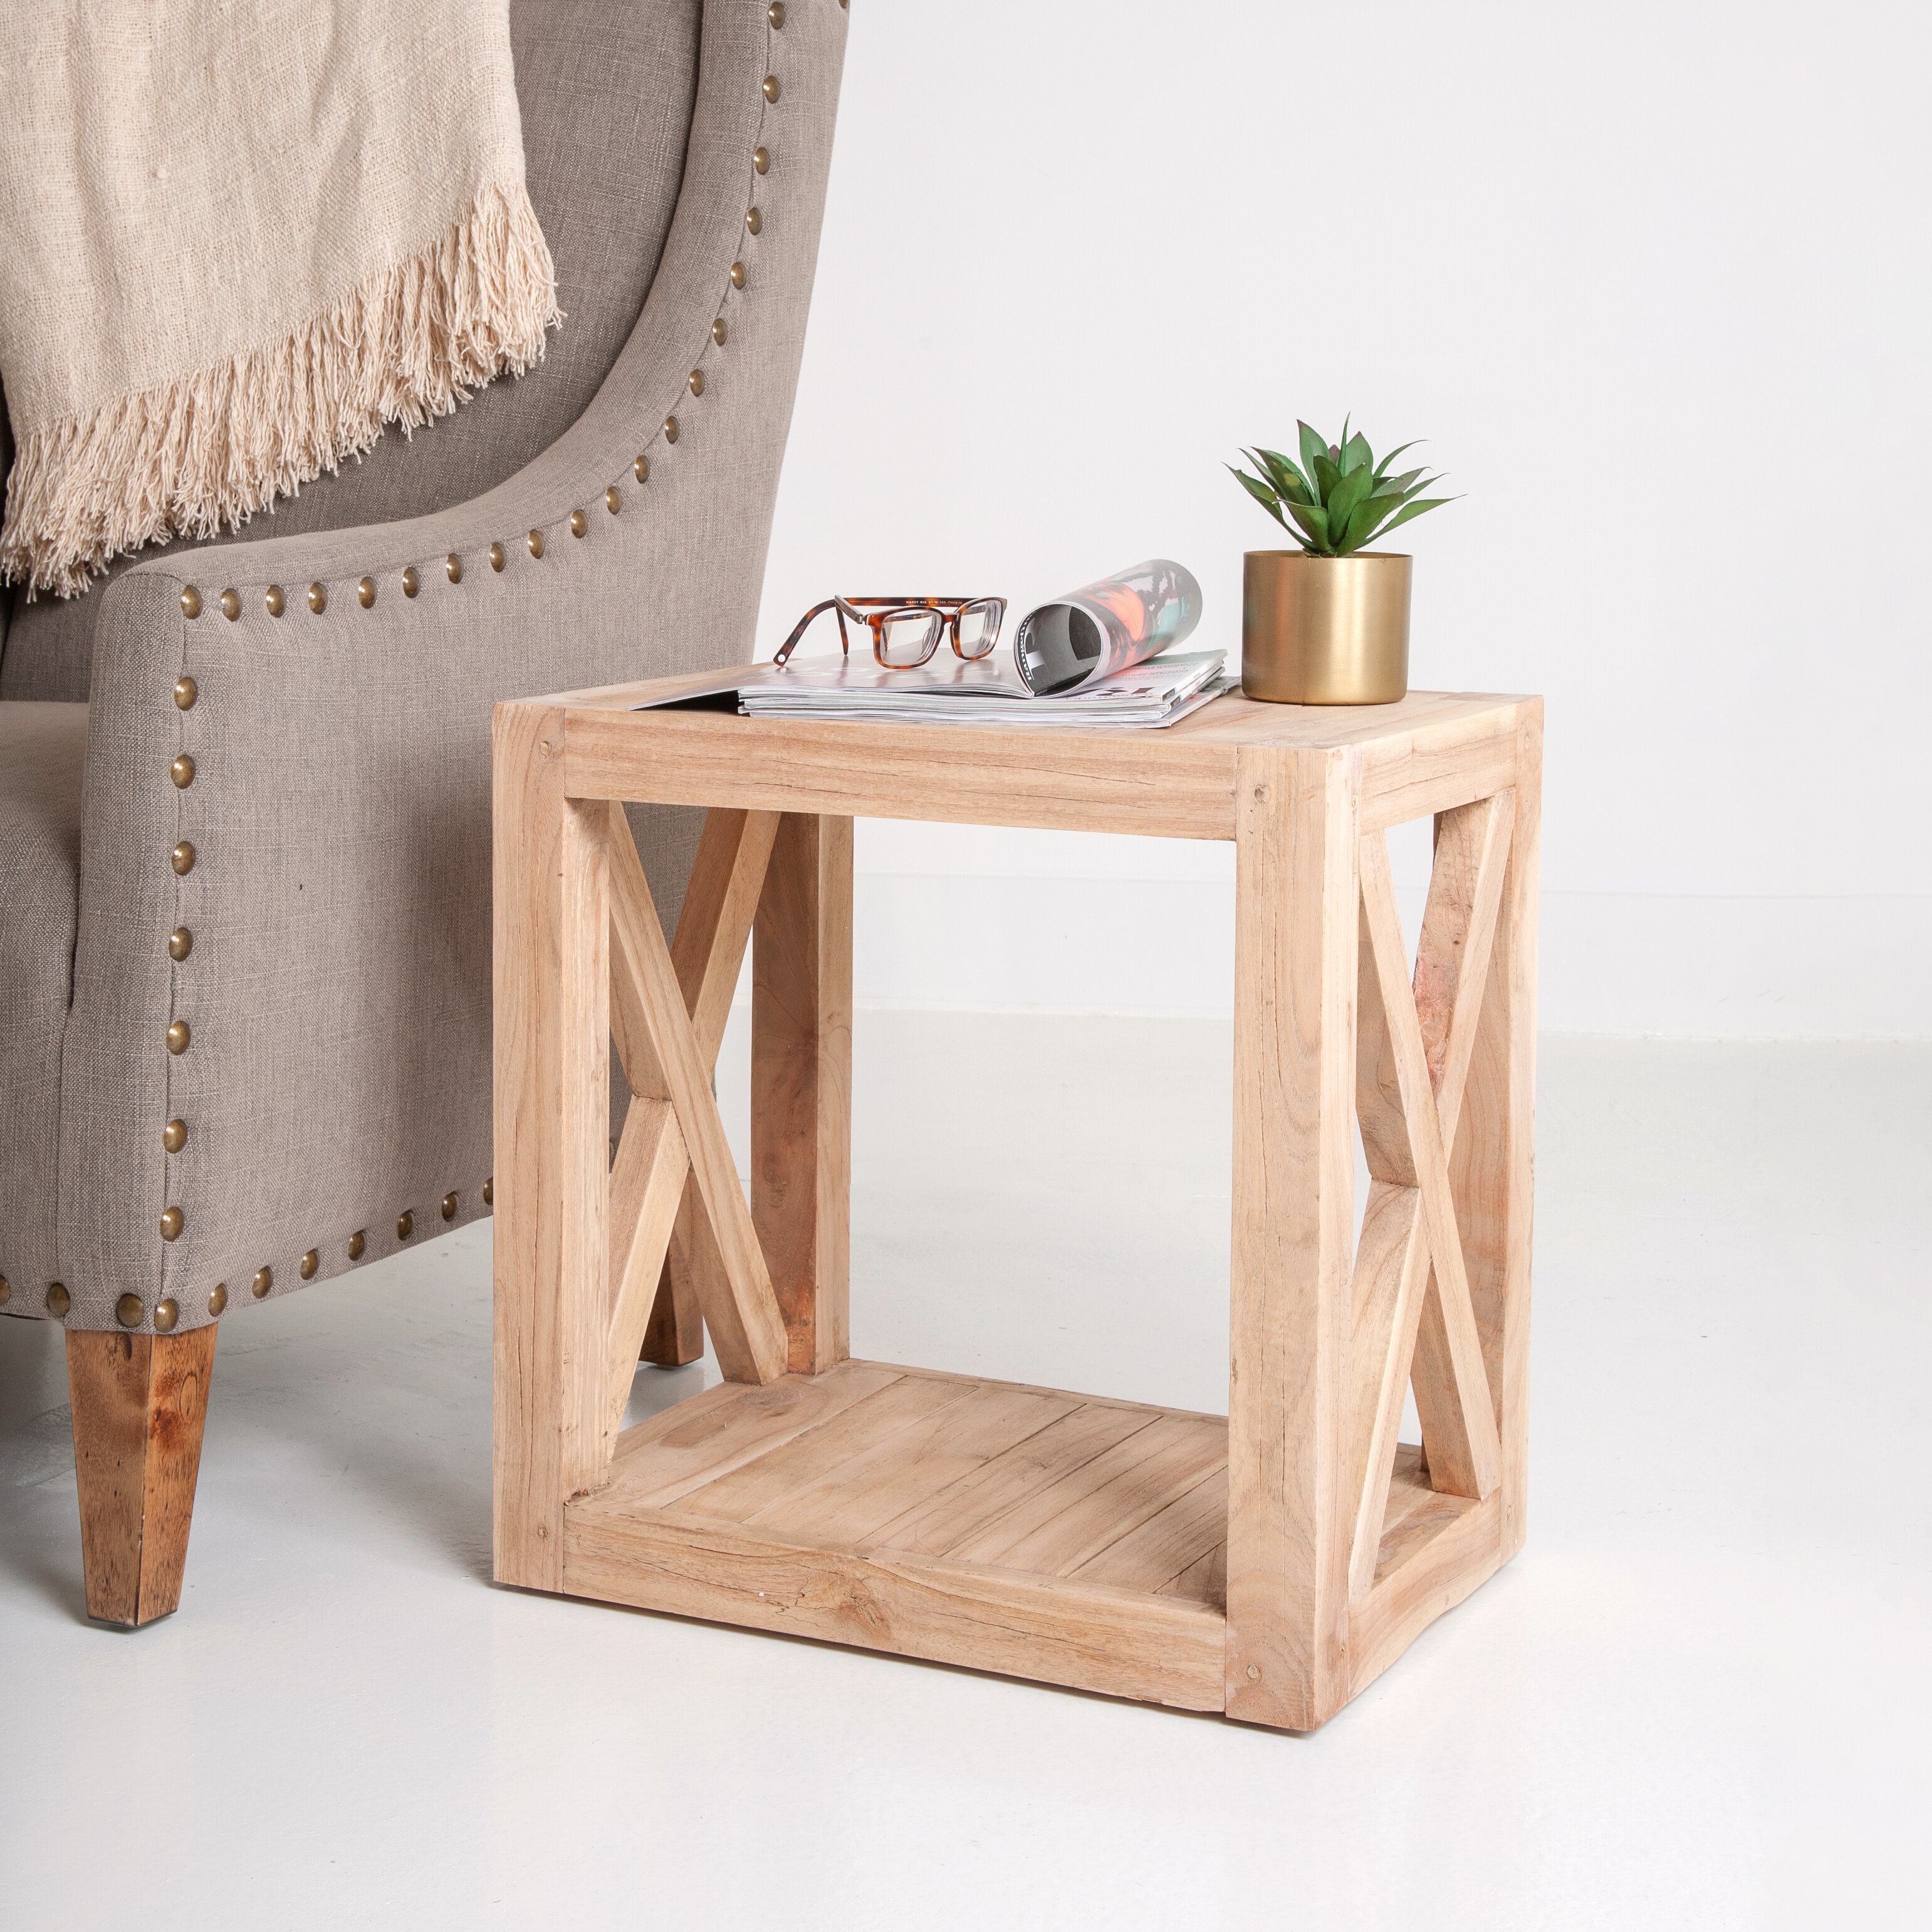 Gracie Oaks Latisha Solid Wood Floor Shelf End Table Reviews Wayfair